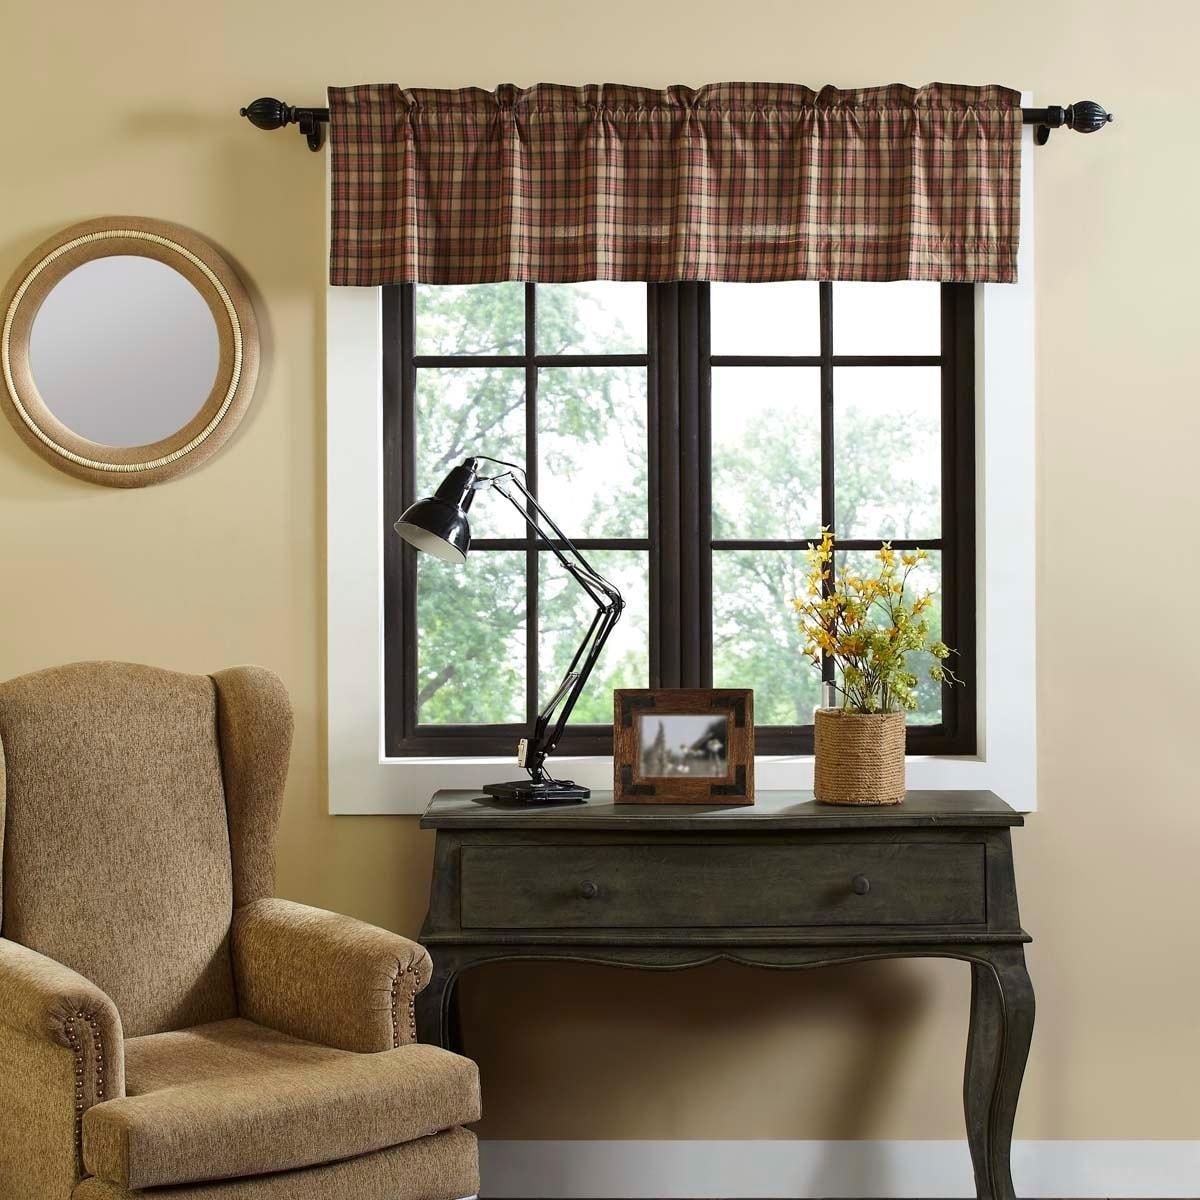 Vhc Primitive Tier Pair Maisie Kitchen Curtains Rod Pocket Tan Cotton